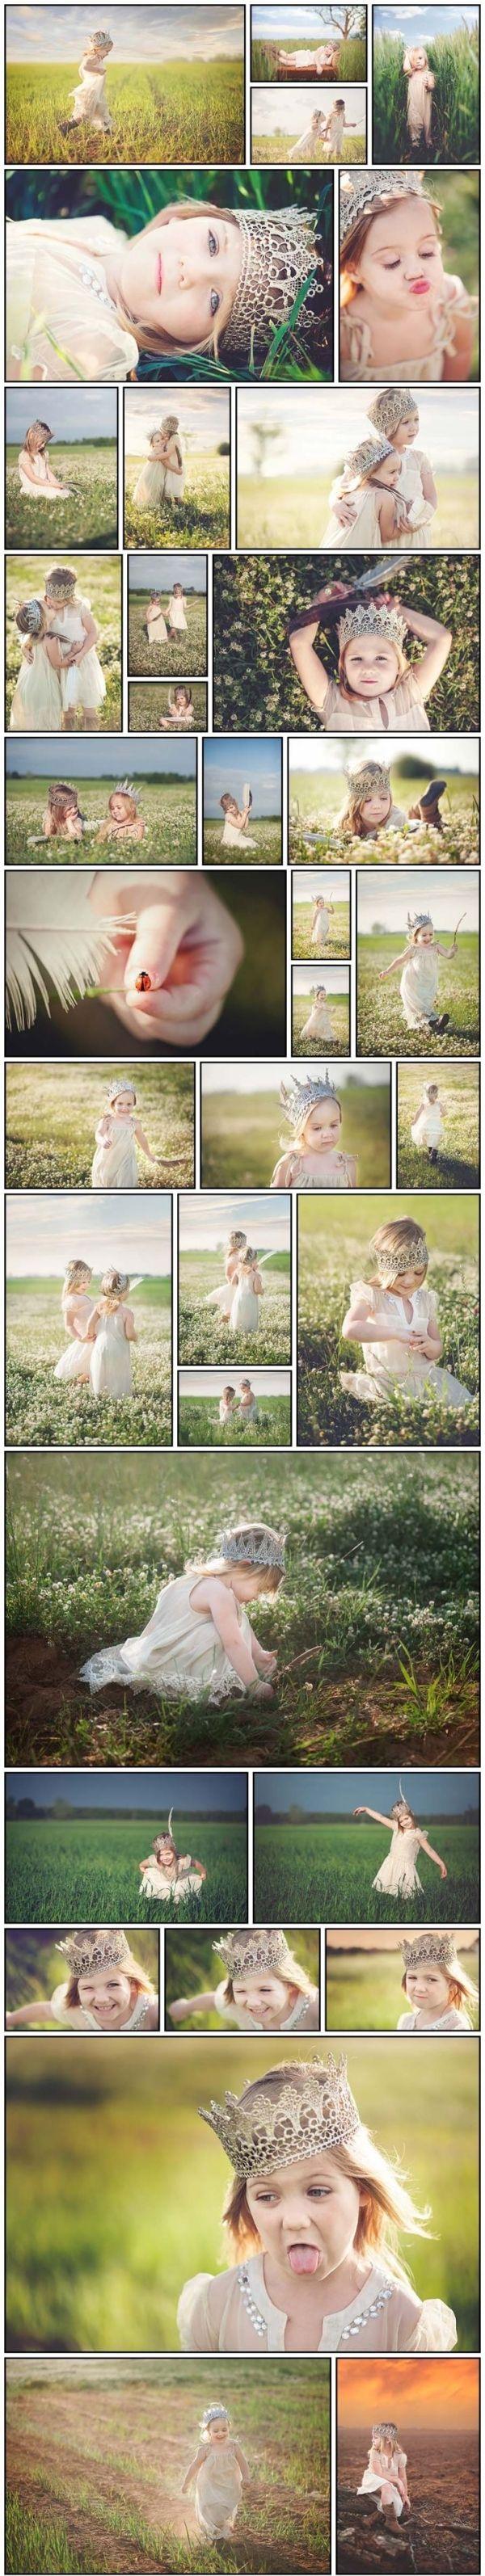 Princess photo shoot | child photography by toni